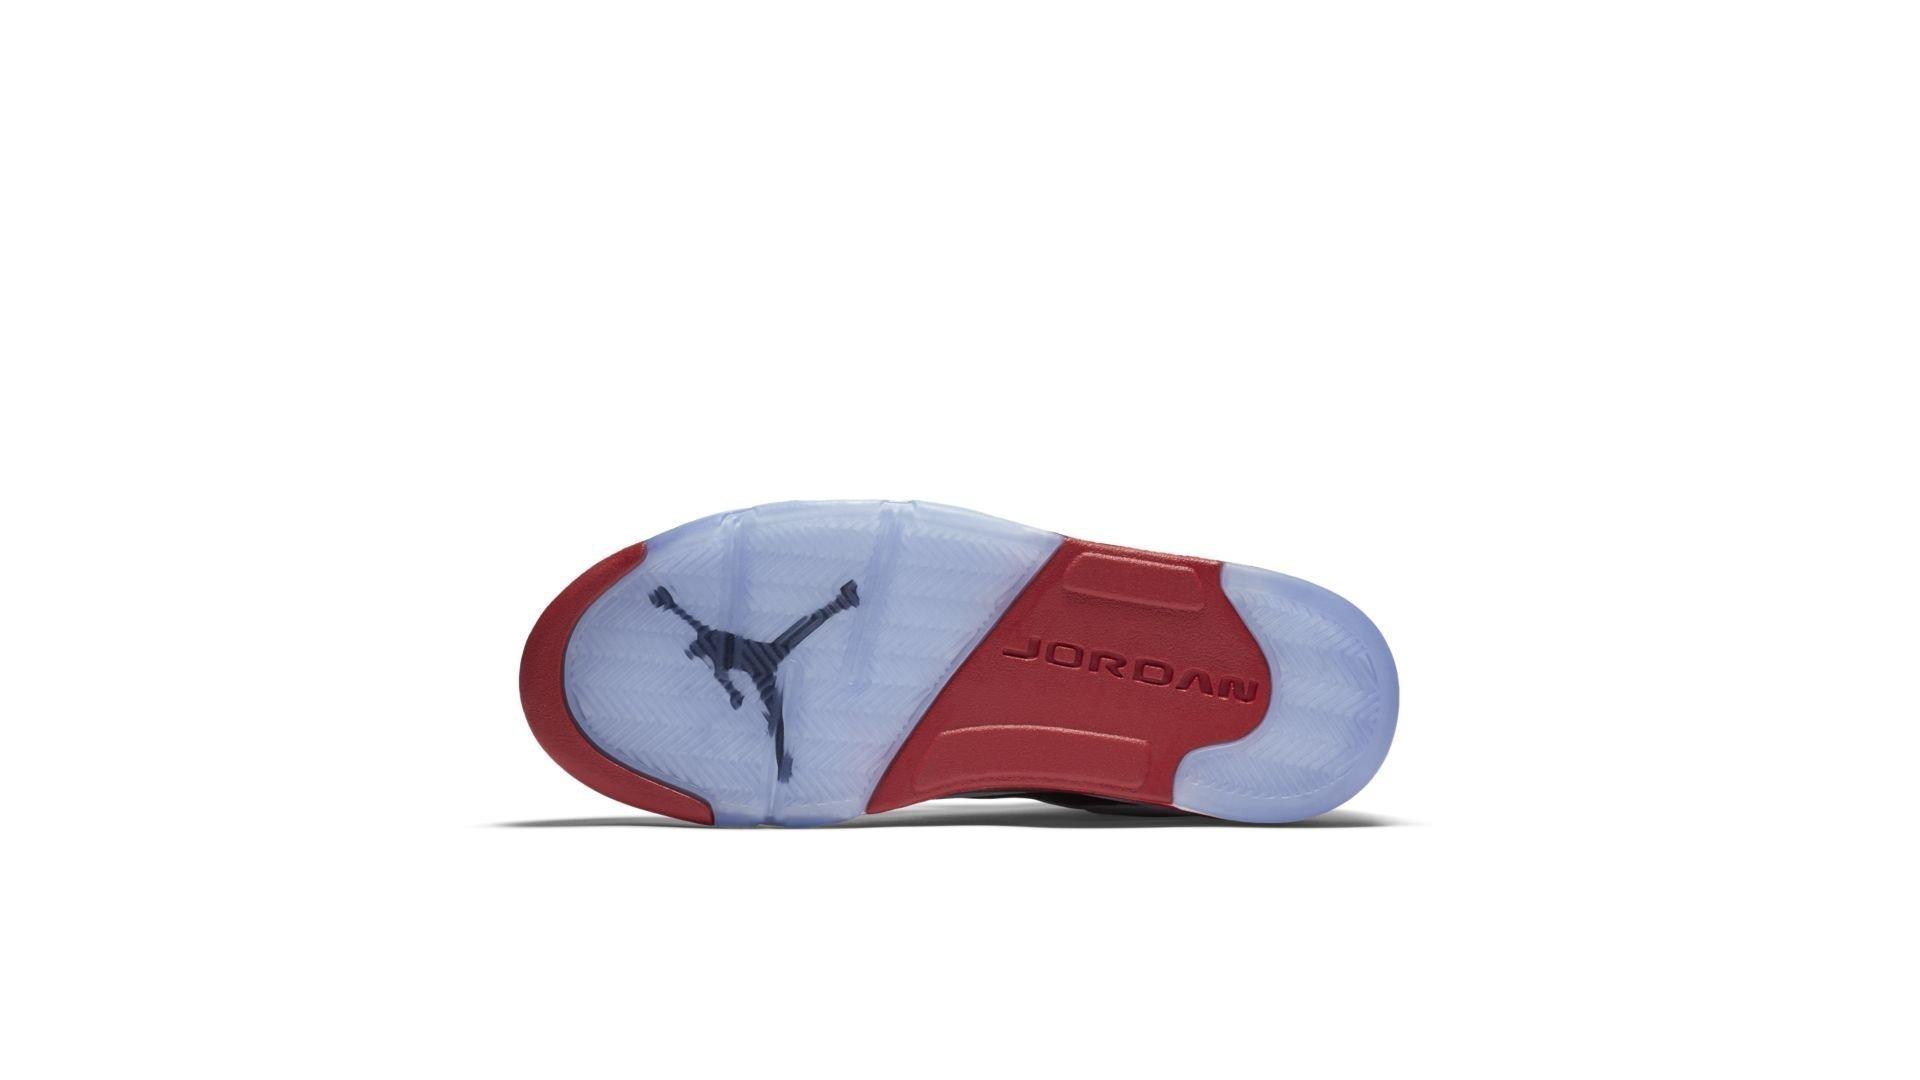 Jordan 5 Retro Low Fire Red (819171-101)